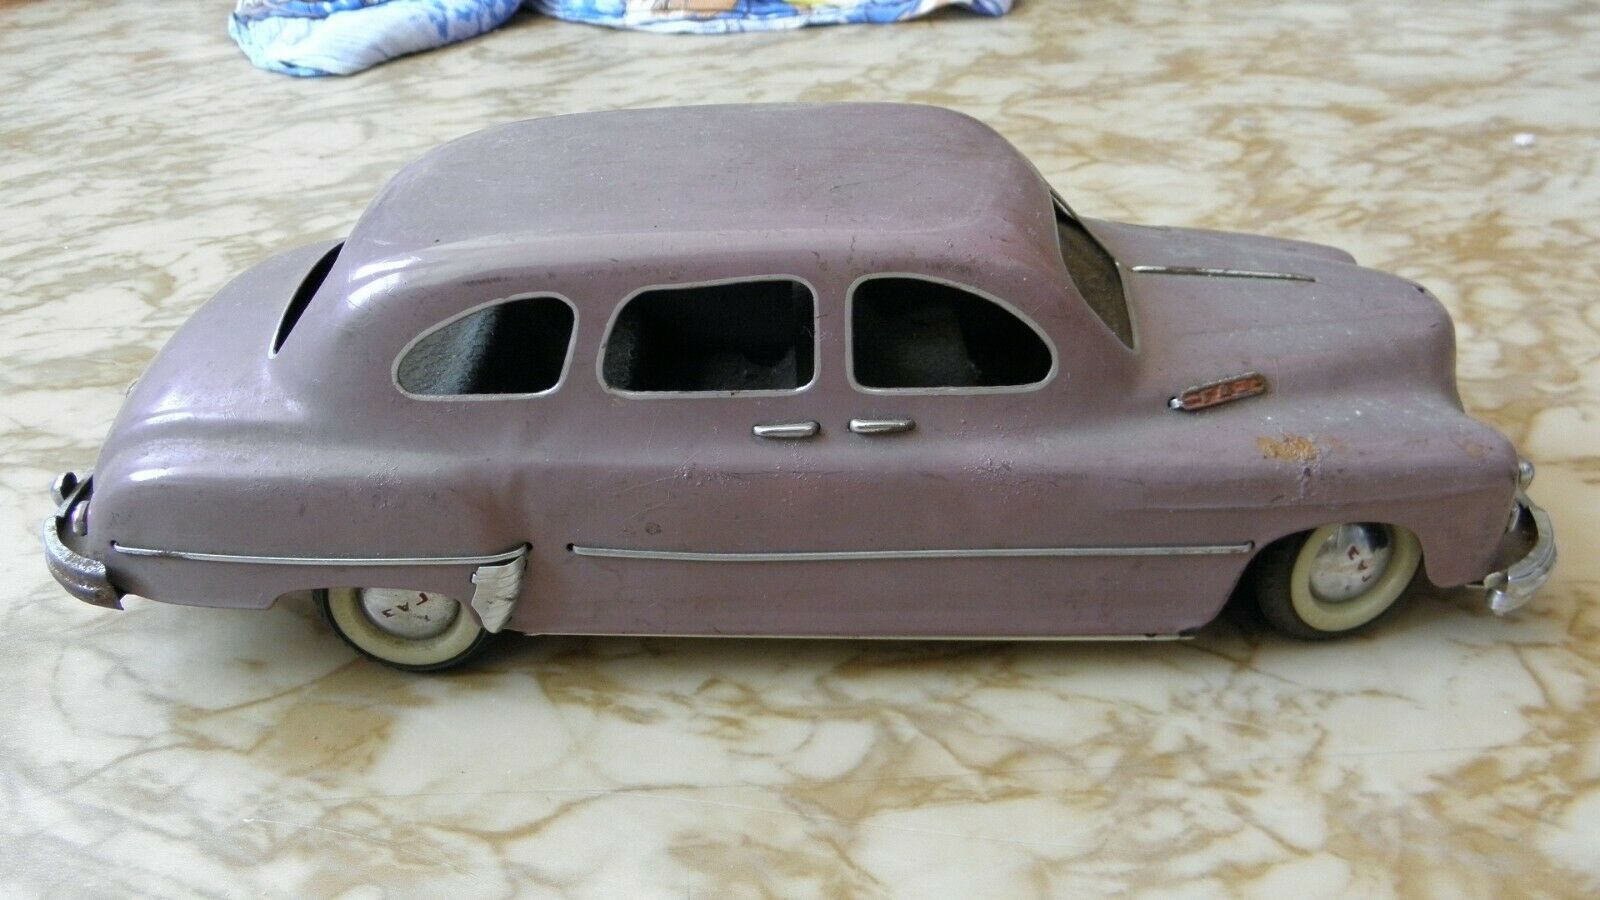 USSR Modelll Spielzeug GAZ-12 ZiM 1950-1960 rarity metal